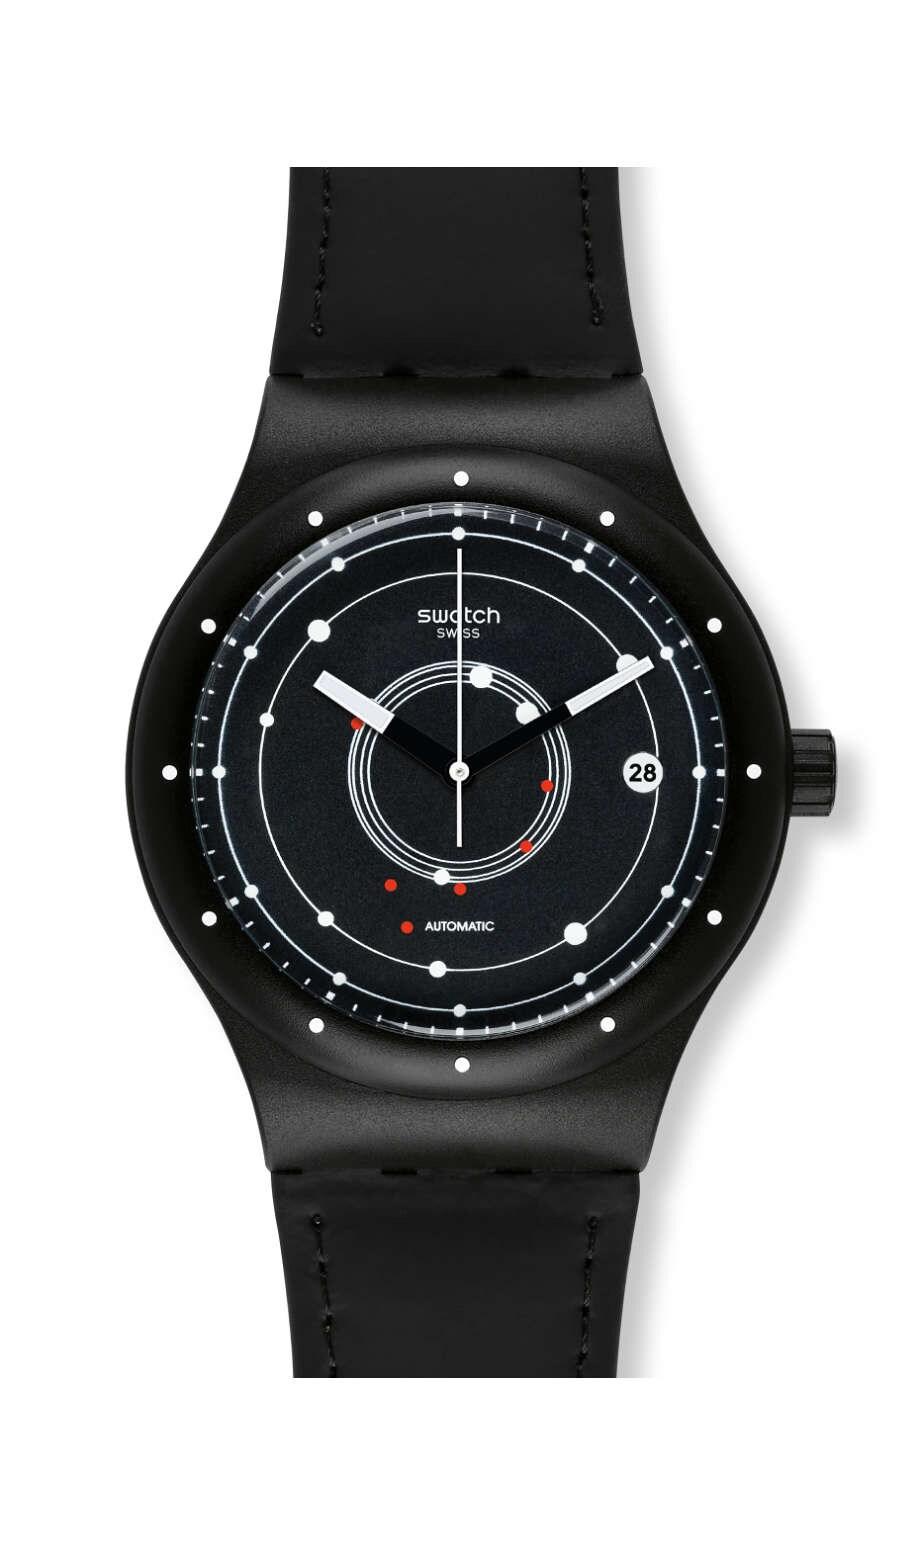 Swatch - SISTEM BLACK - 1